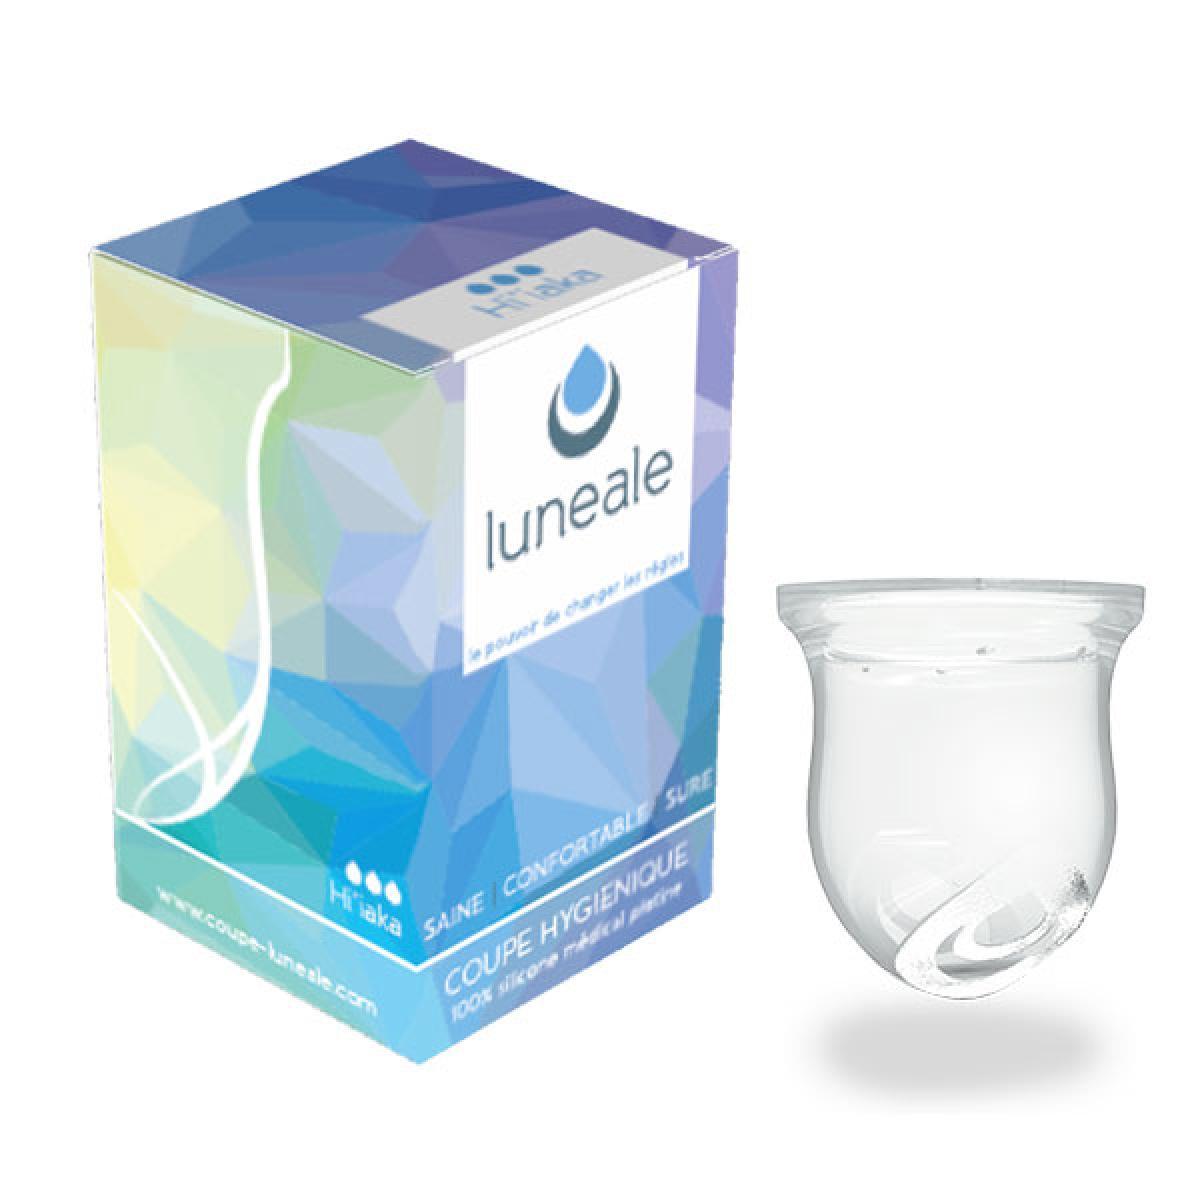 Luneale coupe menstruelle flux fort 30ml parapharmacie pharmarket - Coupe menstruelle en pharmacie ...